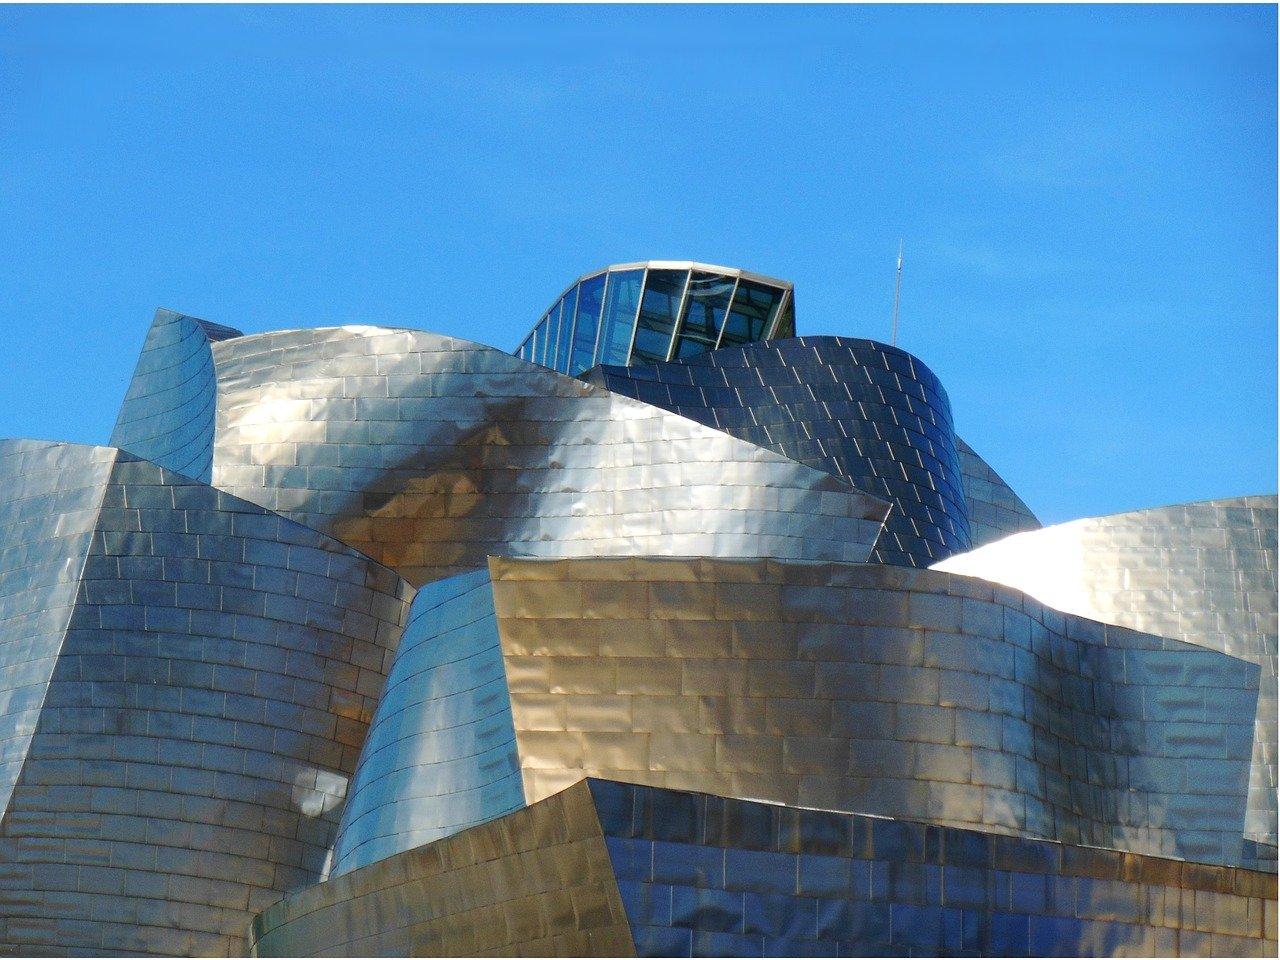 Guggenheim Museum Bilbao (Frank Gehry)